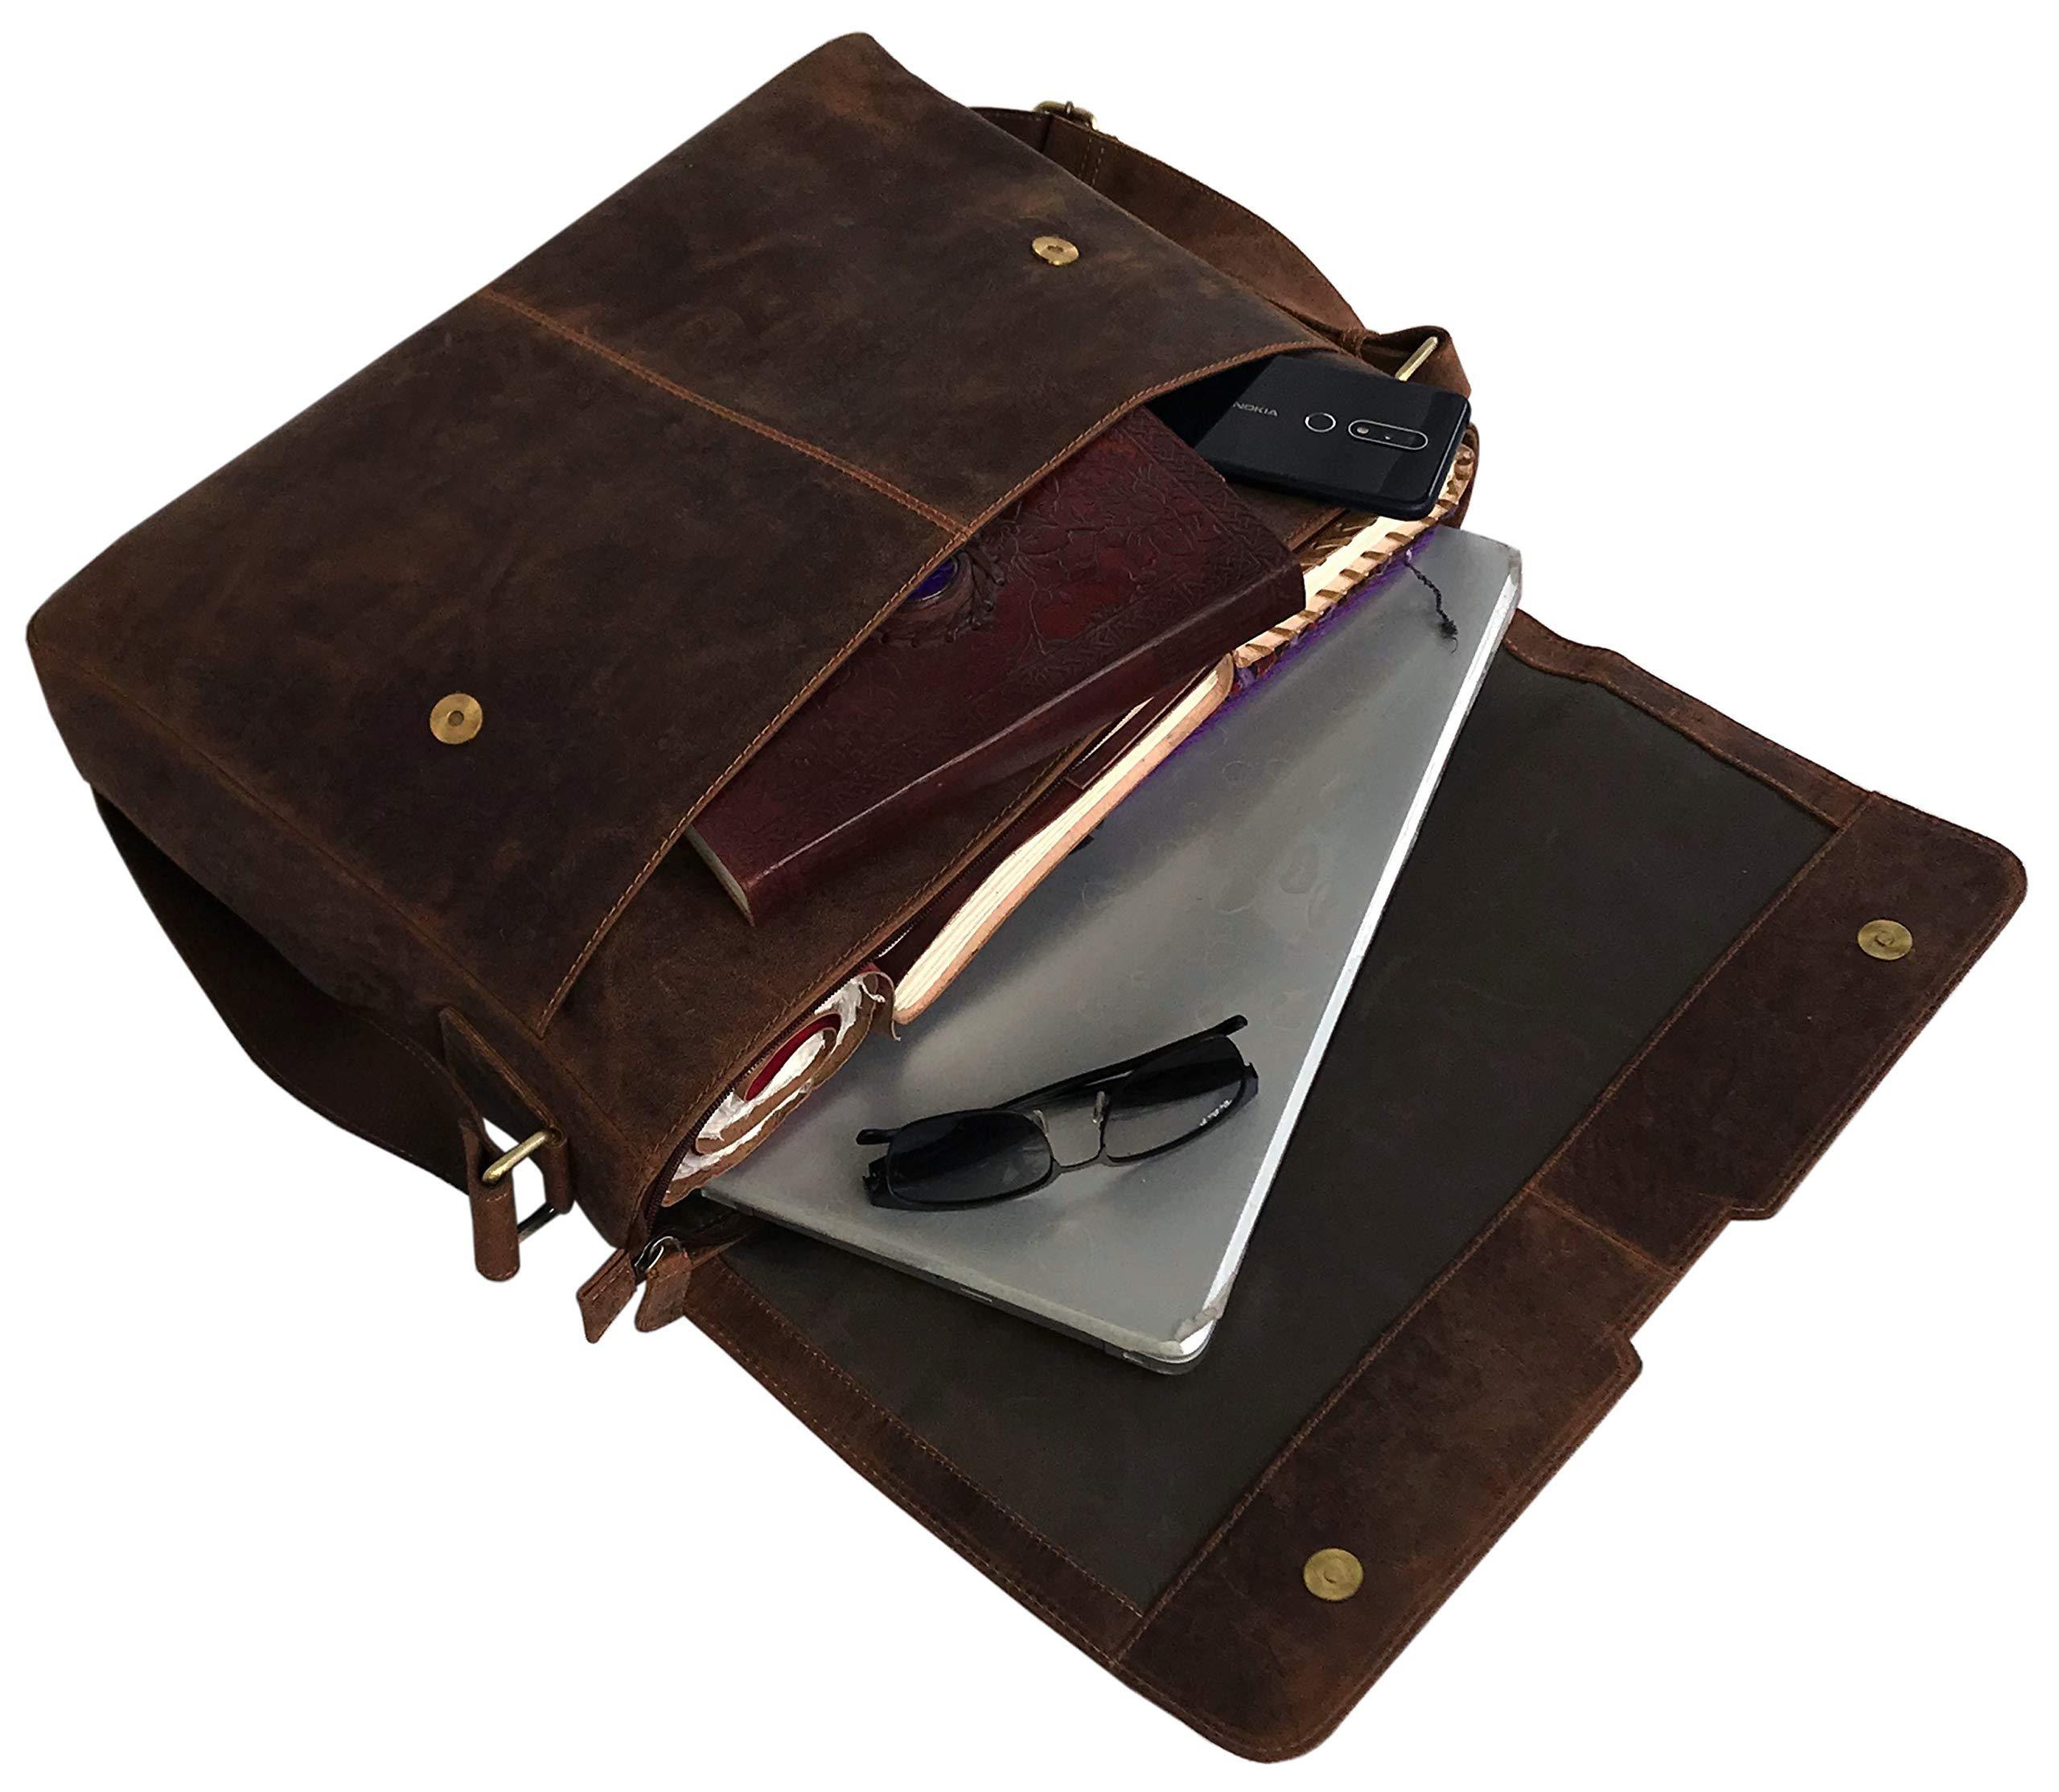 18'' Leather Messenger Bag Vintage Buffalo Satchel Laptop Briefcase Unisex Computer Bags for Men Women (Vintage Brown) by cuero (Image #5)